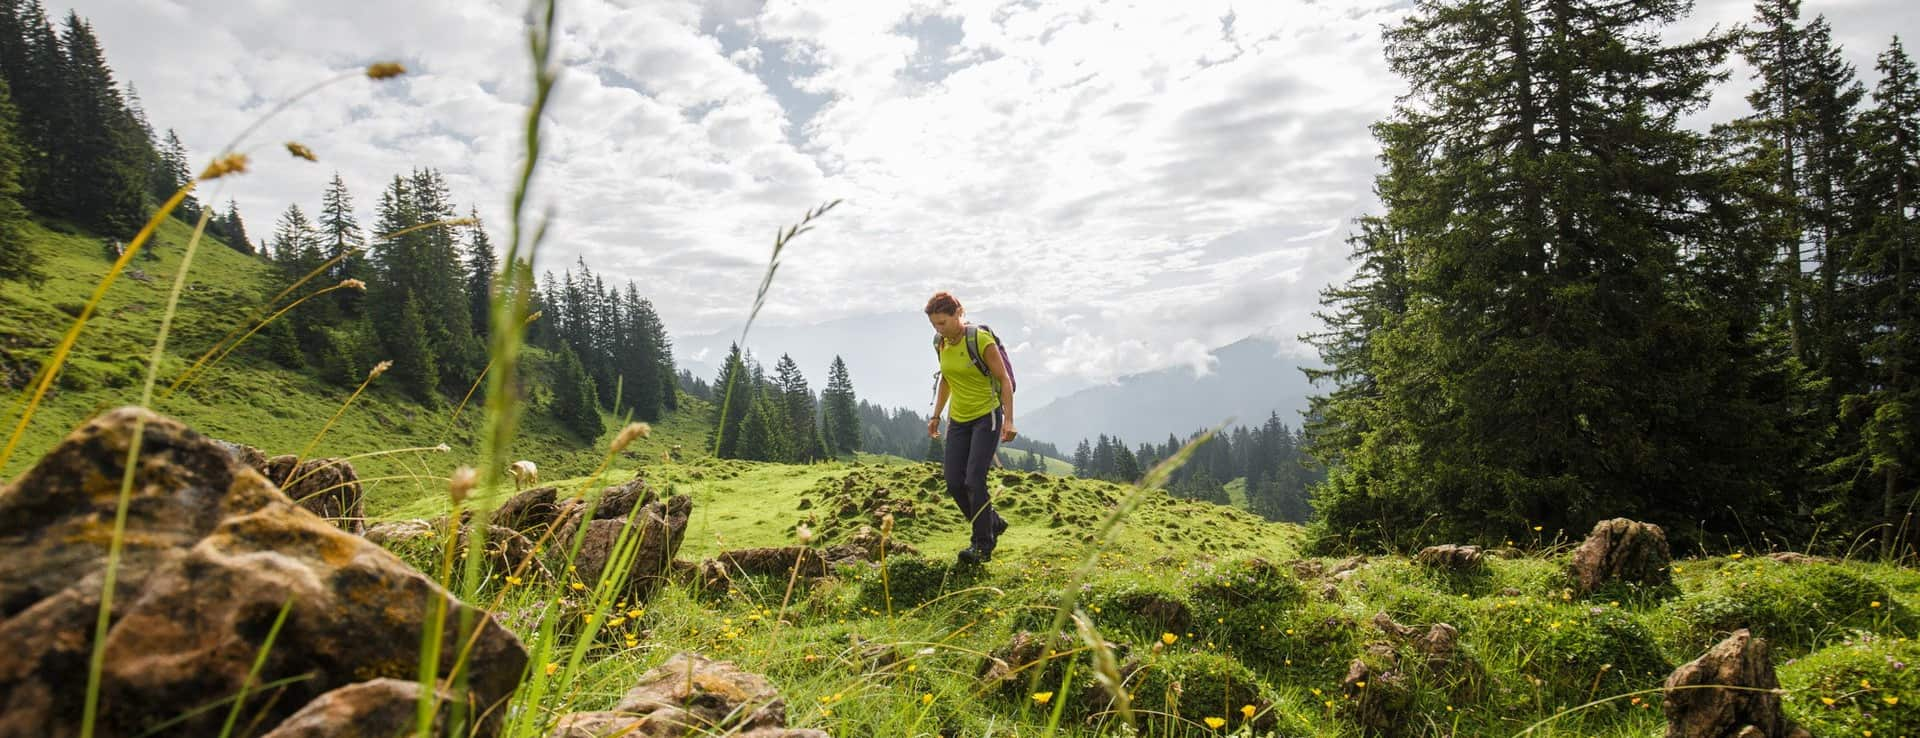 Saalfelden semester vandring i Österrike